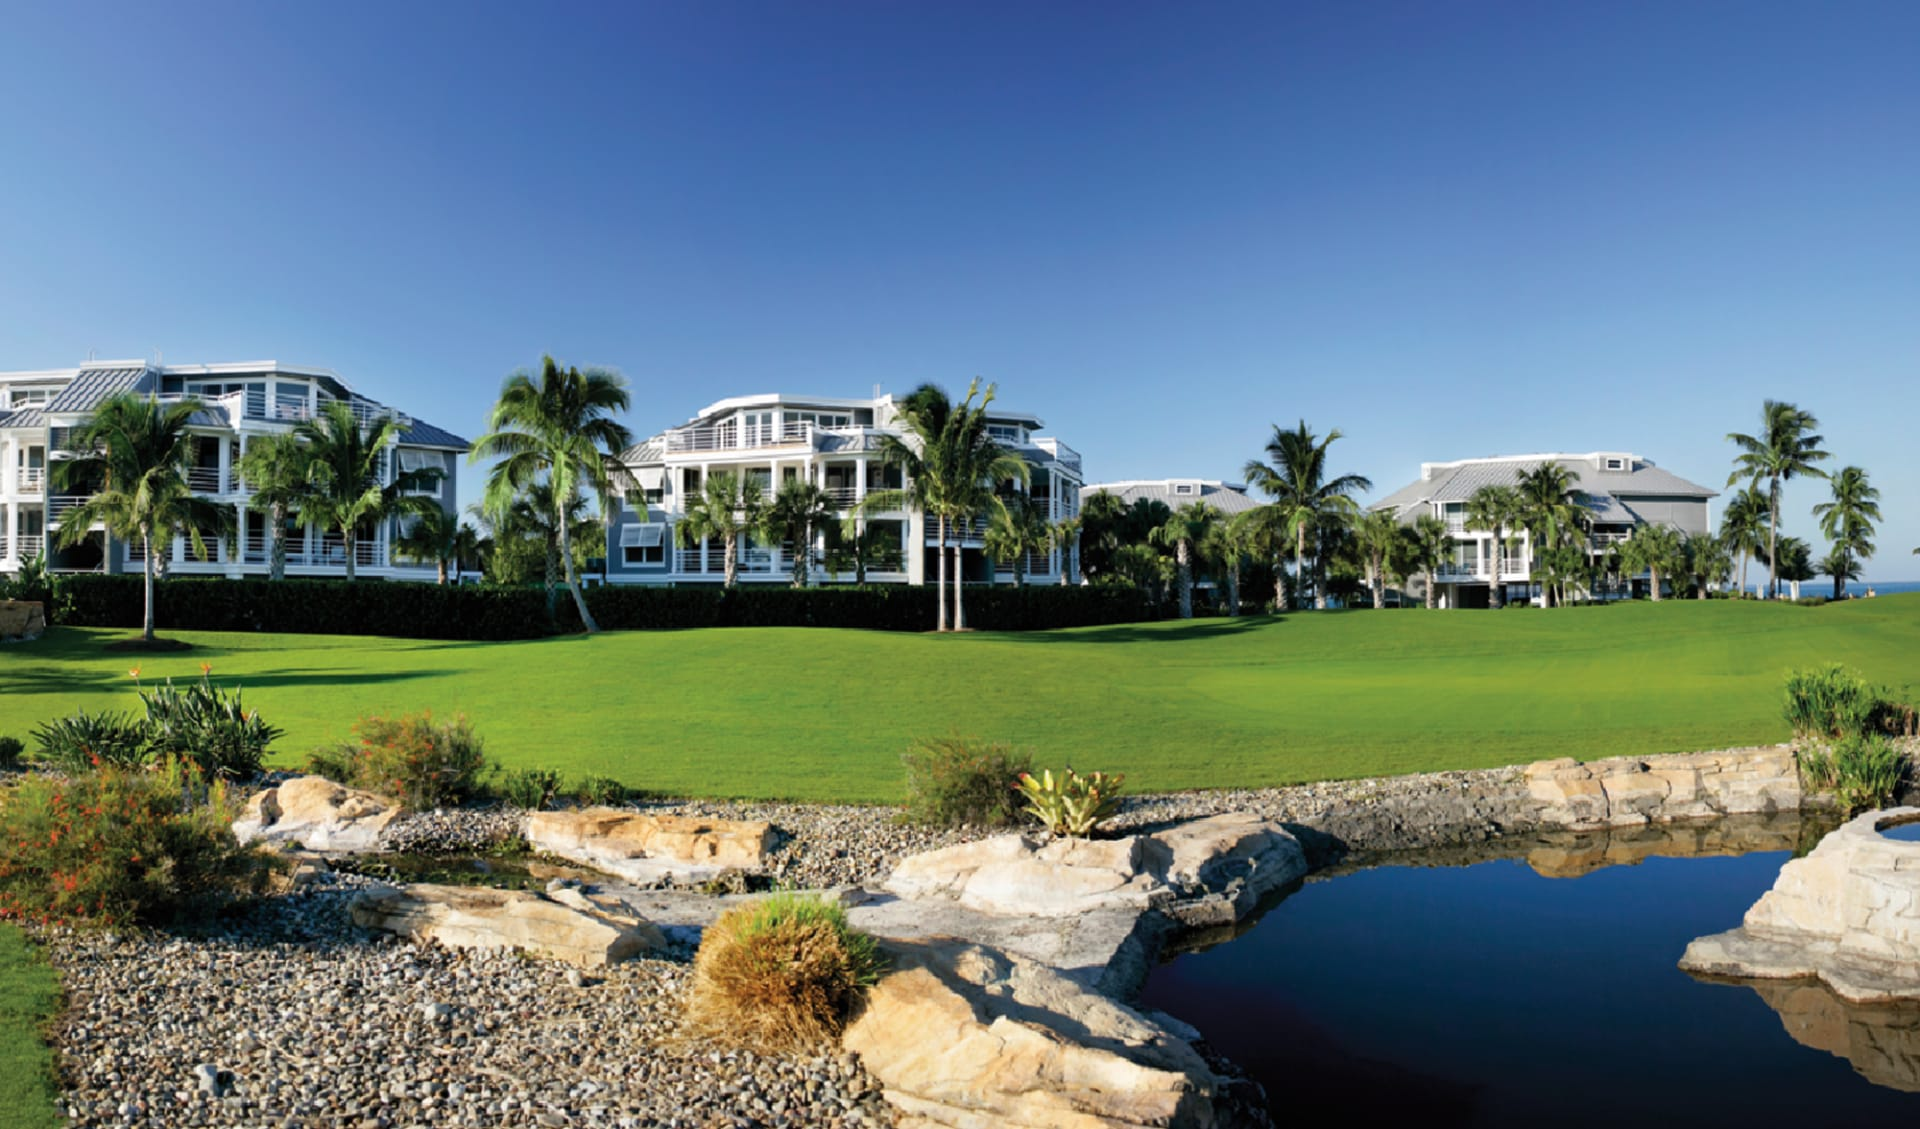 South Seas Island Resort in Captiva Island: facilities south seas island resort garten häuser